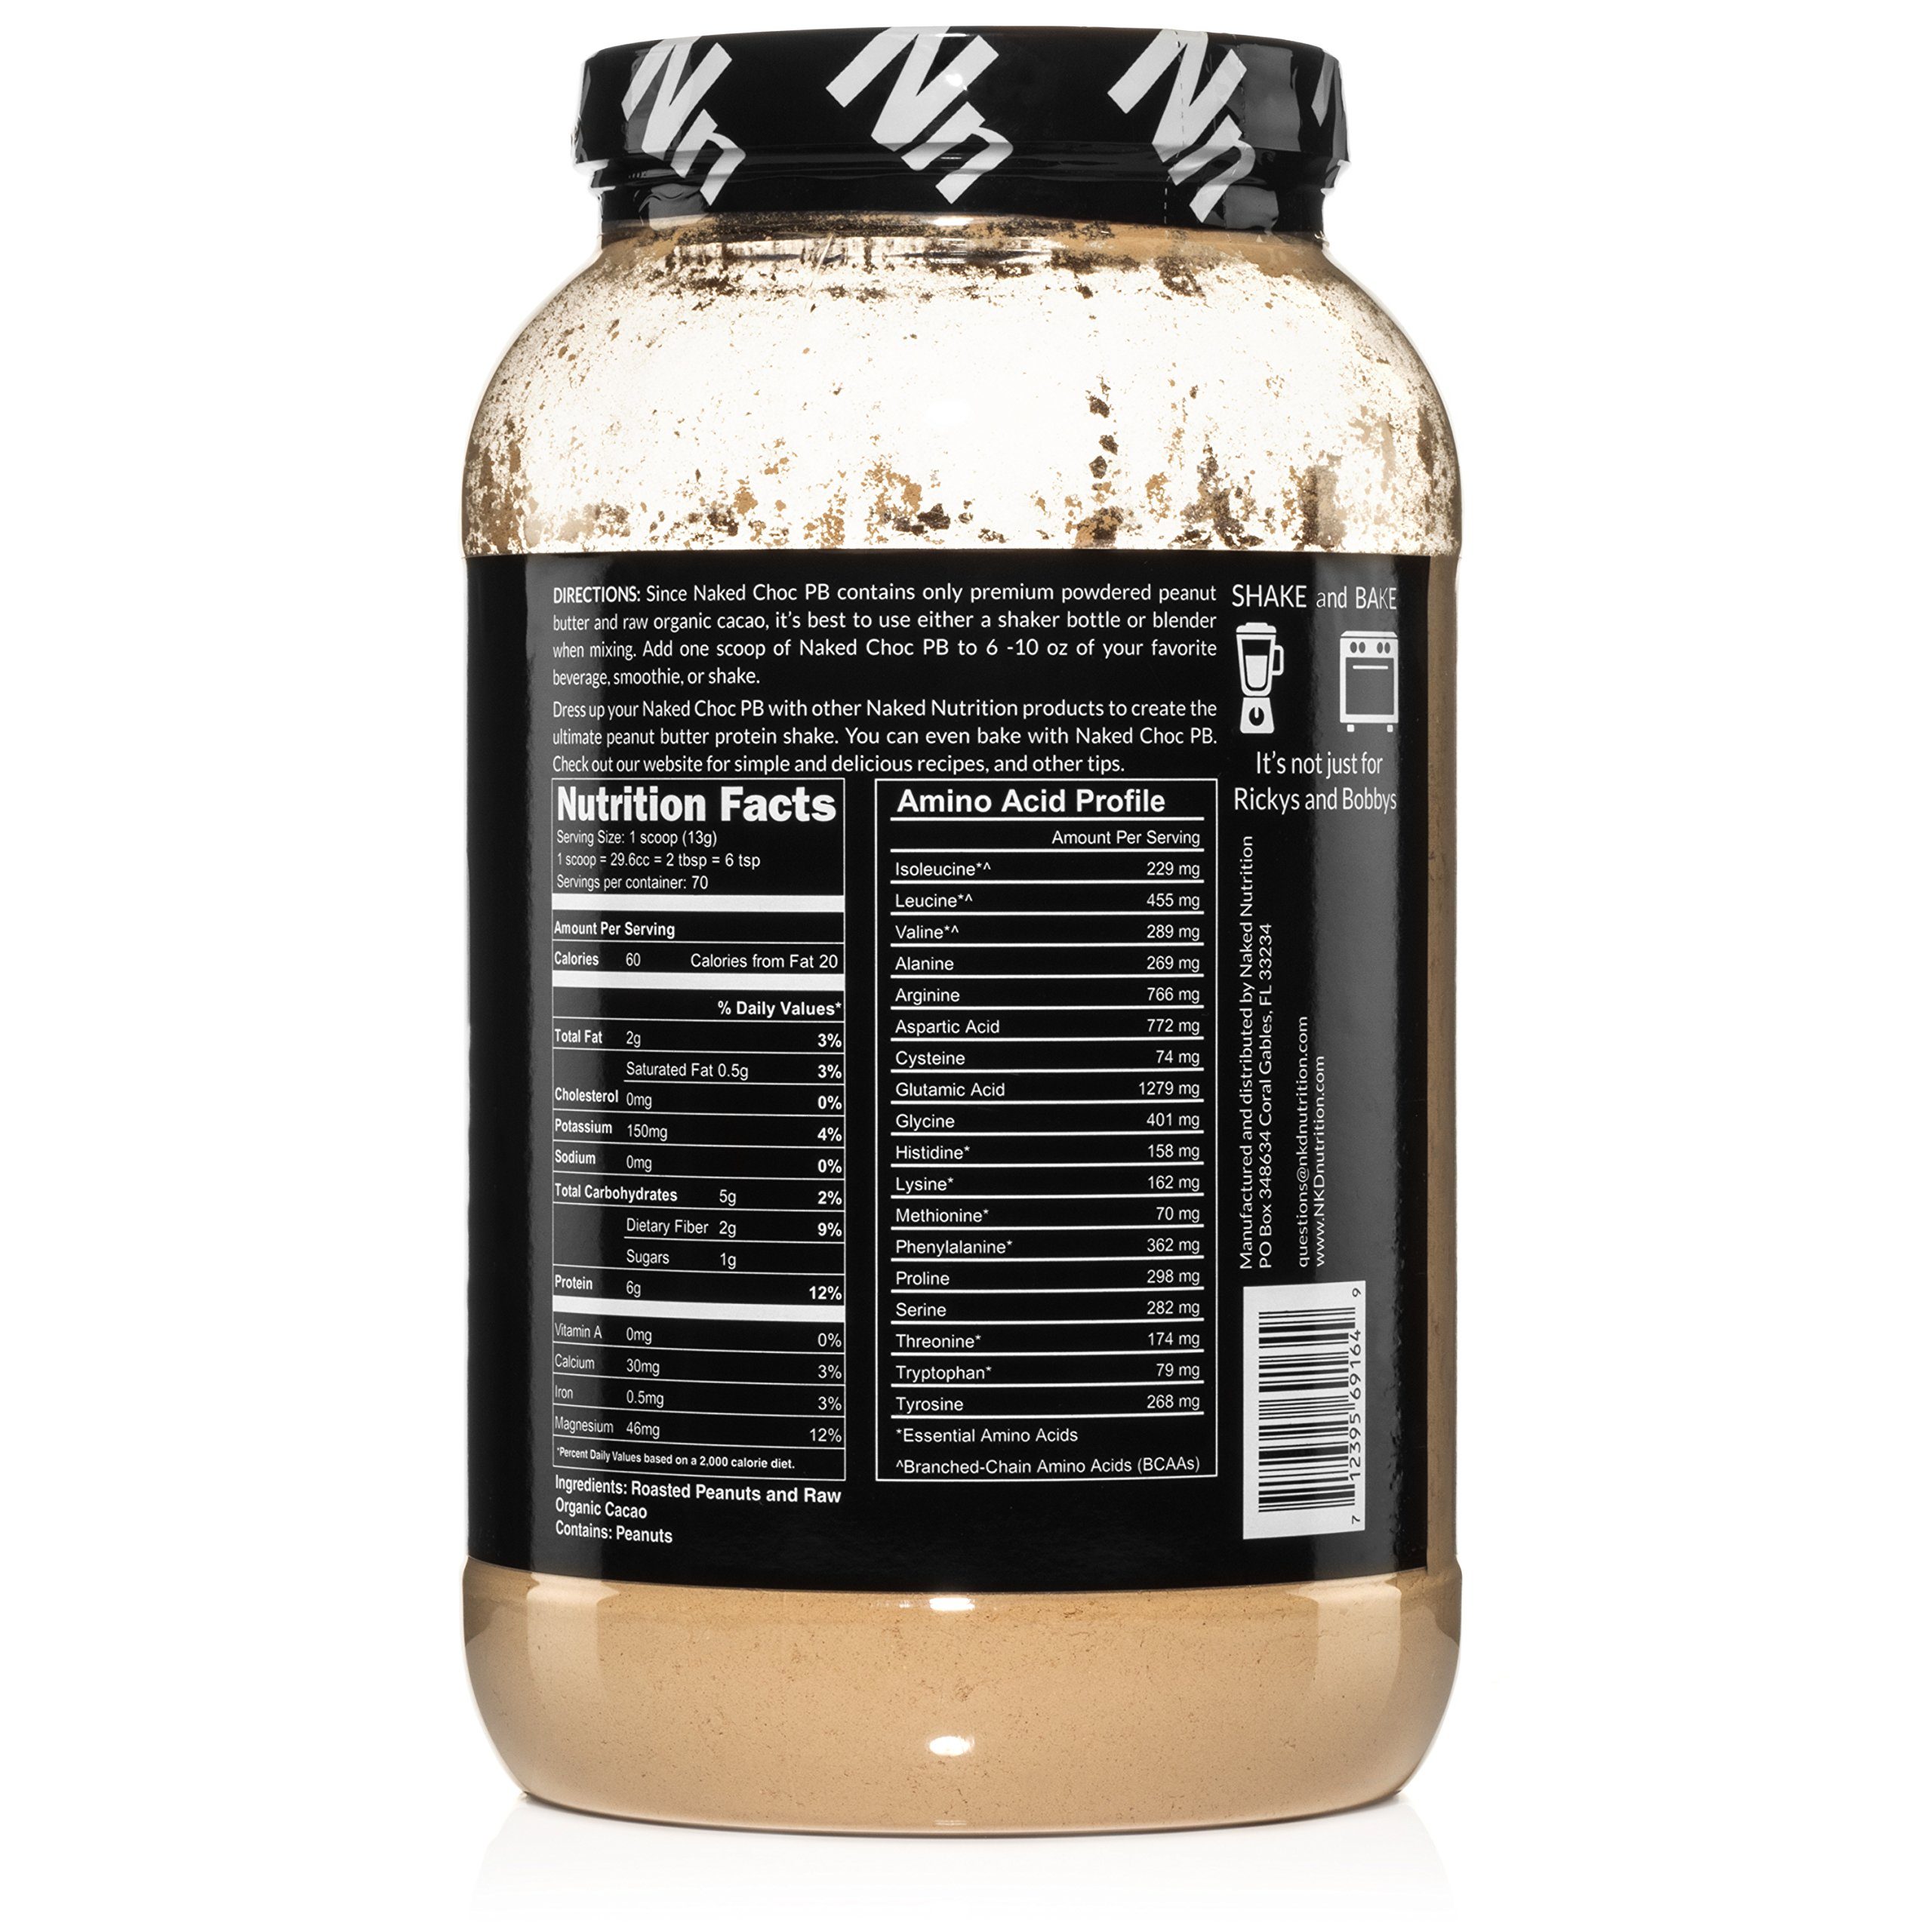 NAKED CHOC PB - Premium Organic Cacao and Powdered PB - 2lb Bulk by NAKED nutrition (Image #4)